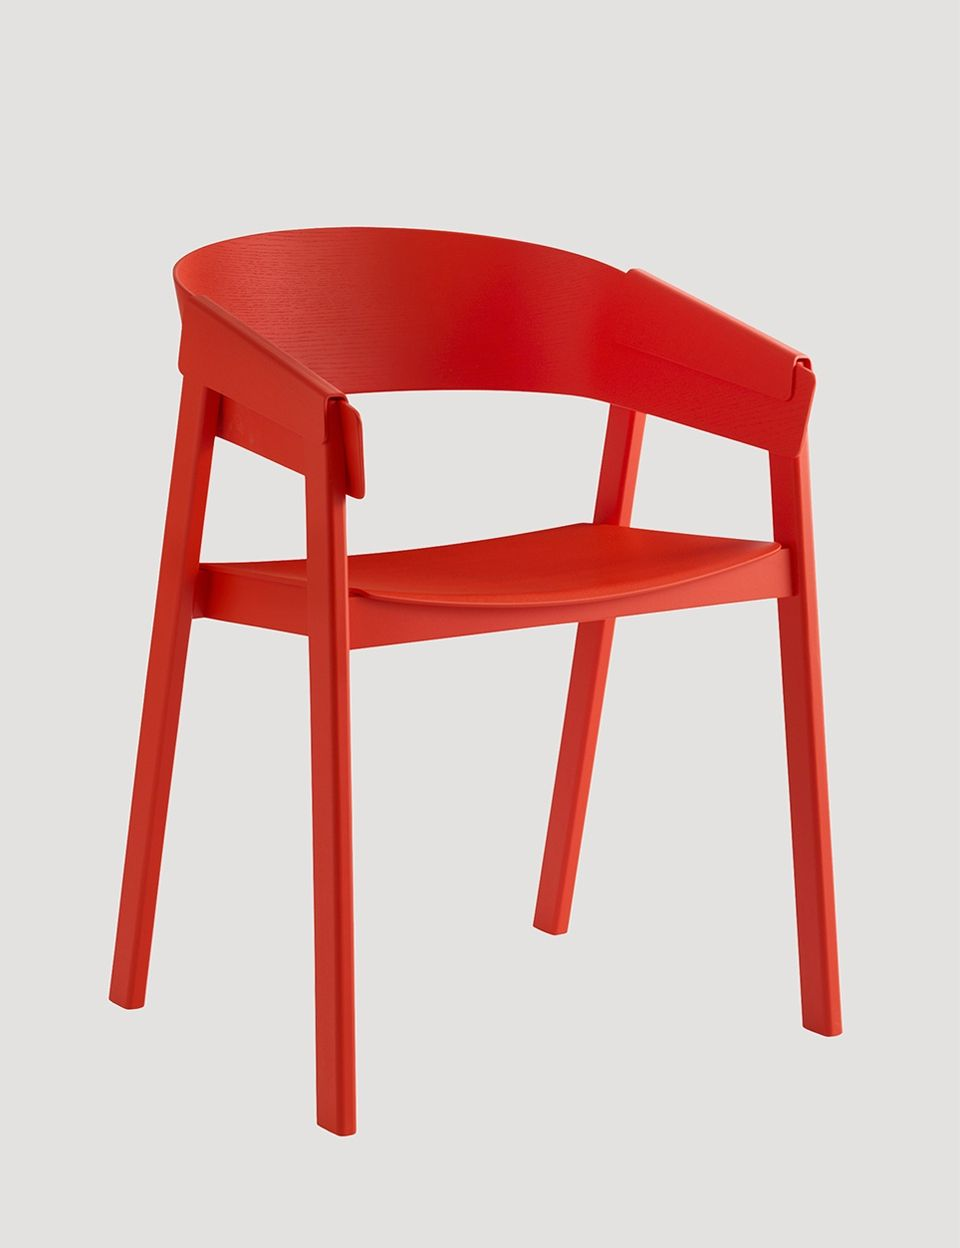 COVER Chair in red, designed by Thomas Bentzen #muuto #muutodesign